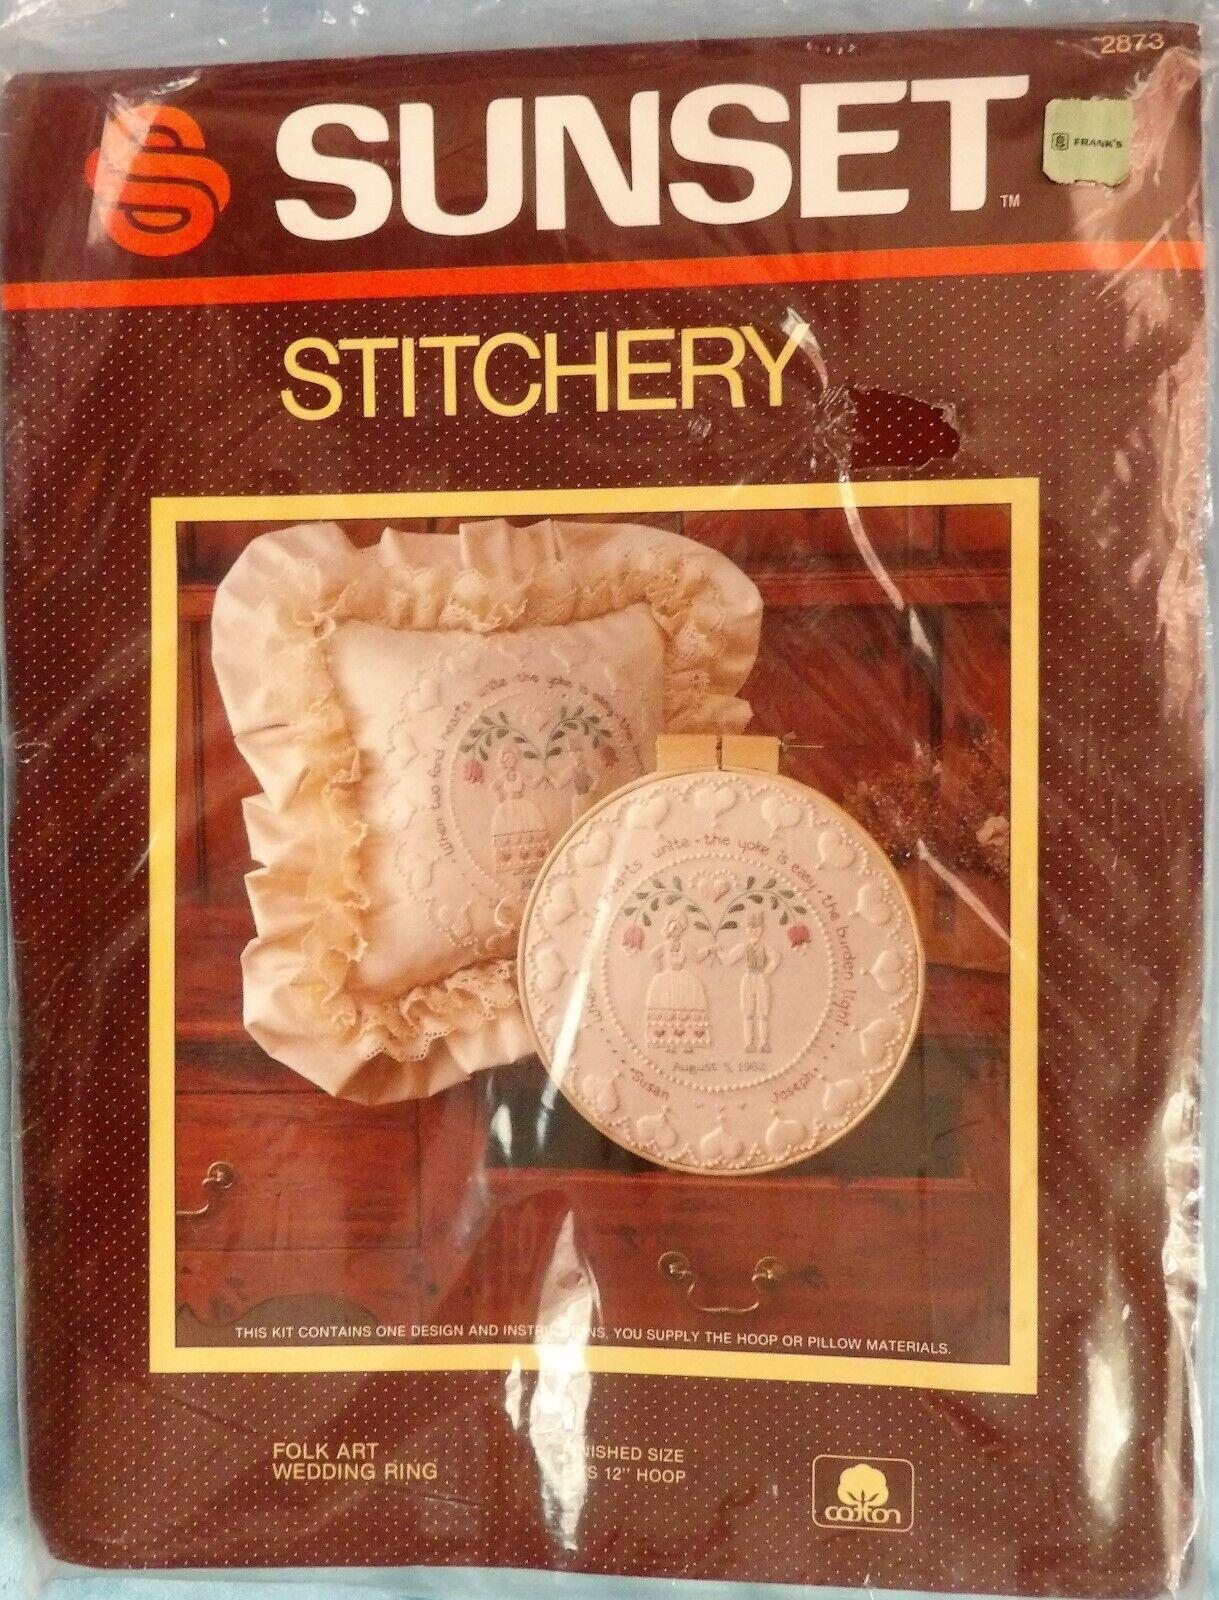 1983 folk art wedding ring embroidery kit